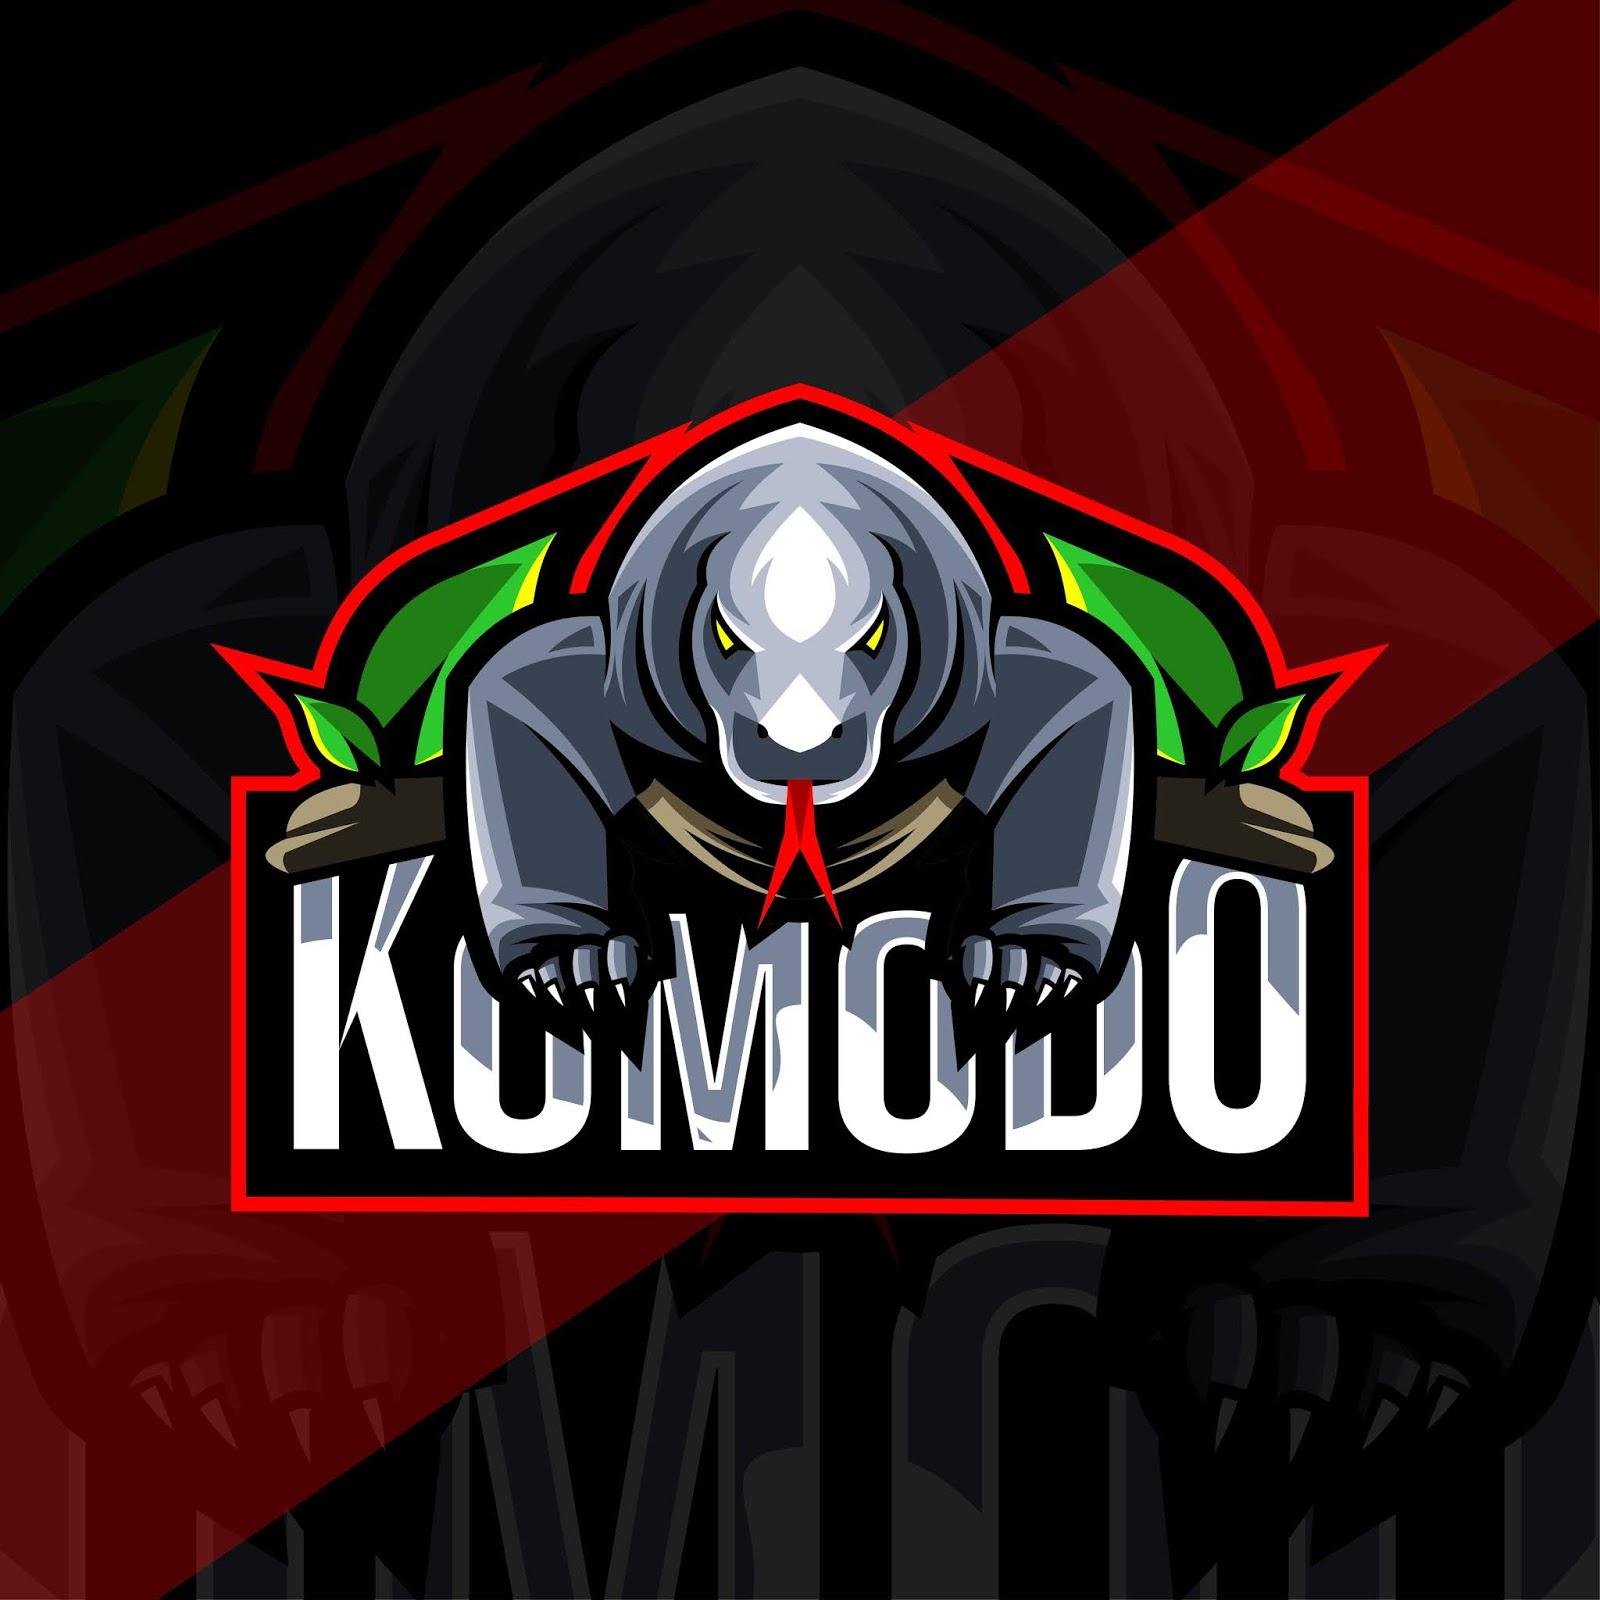 Komodo Mascot Logo Esport Template Free Download Vector CDR, AI, EPS and PNG Formats